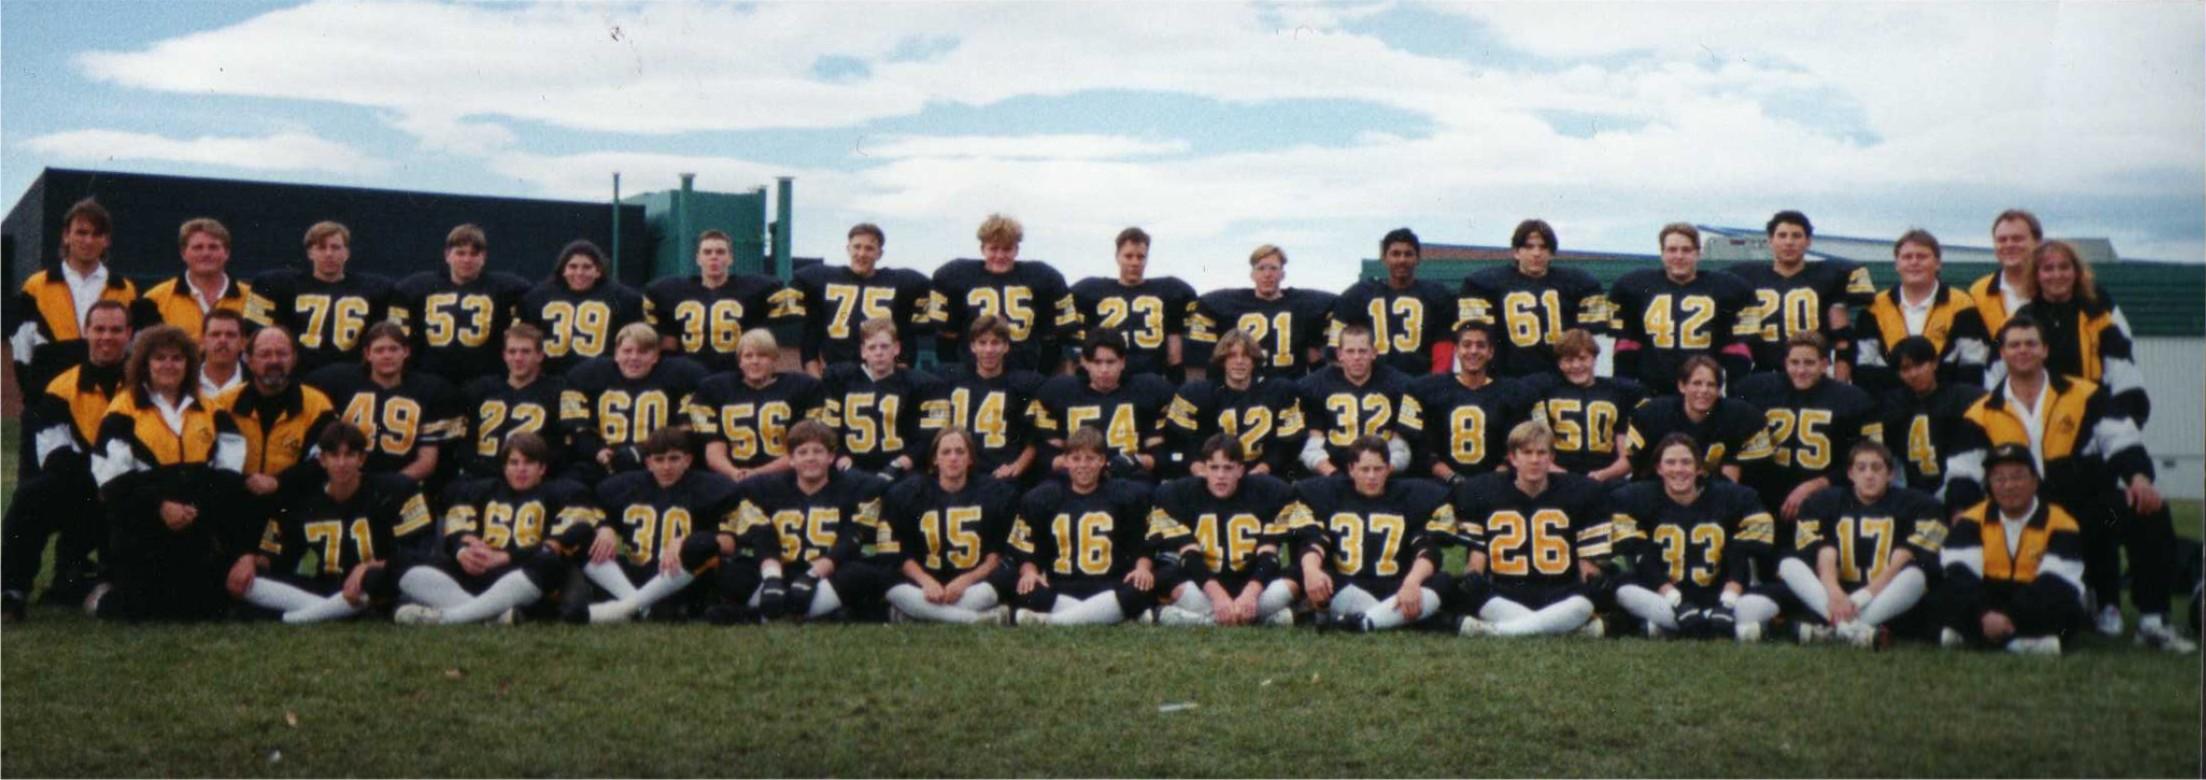 1995 Las Vegas Team